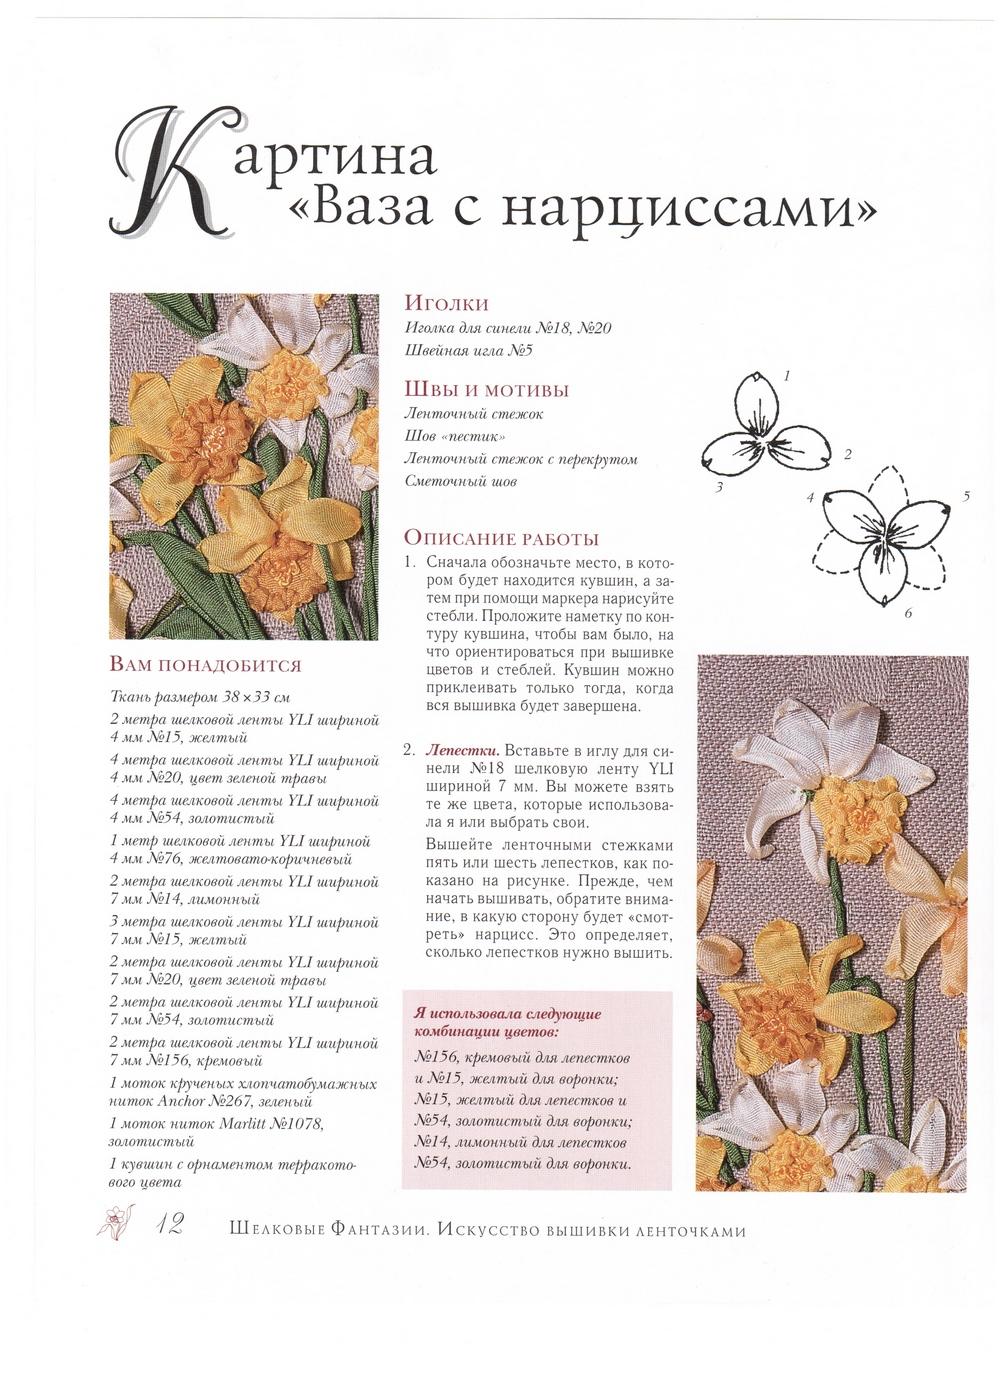 http://images.vfl.ru/ii/1353603398/991ce054/1254256.jpg